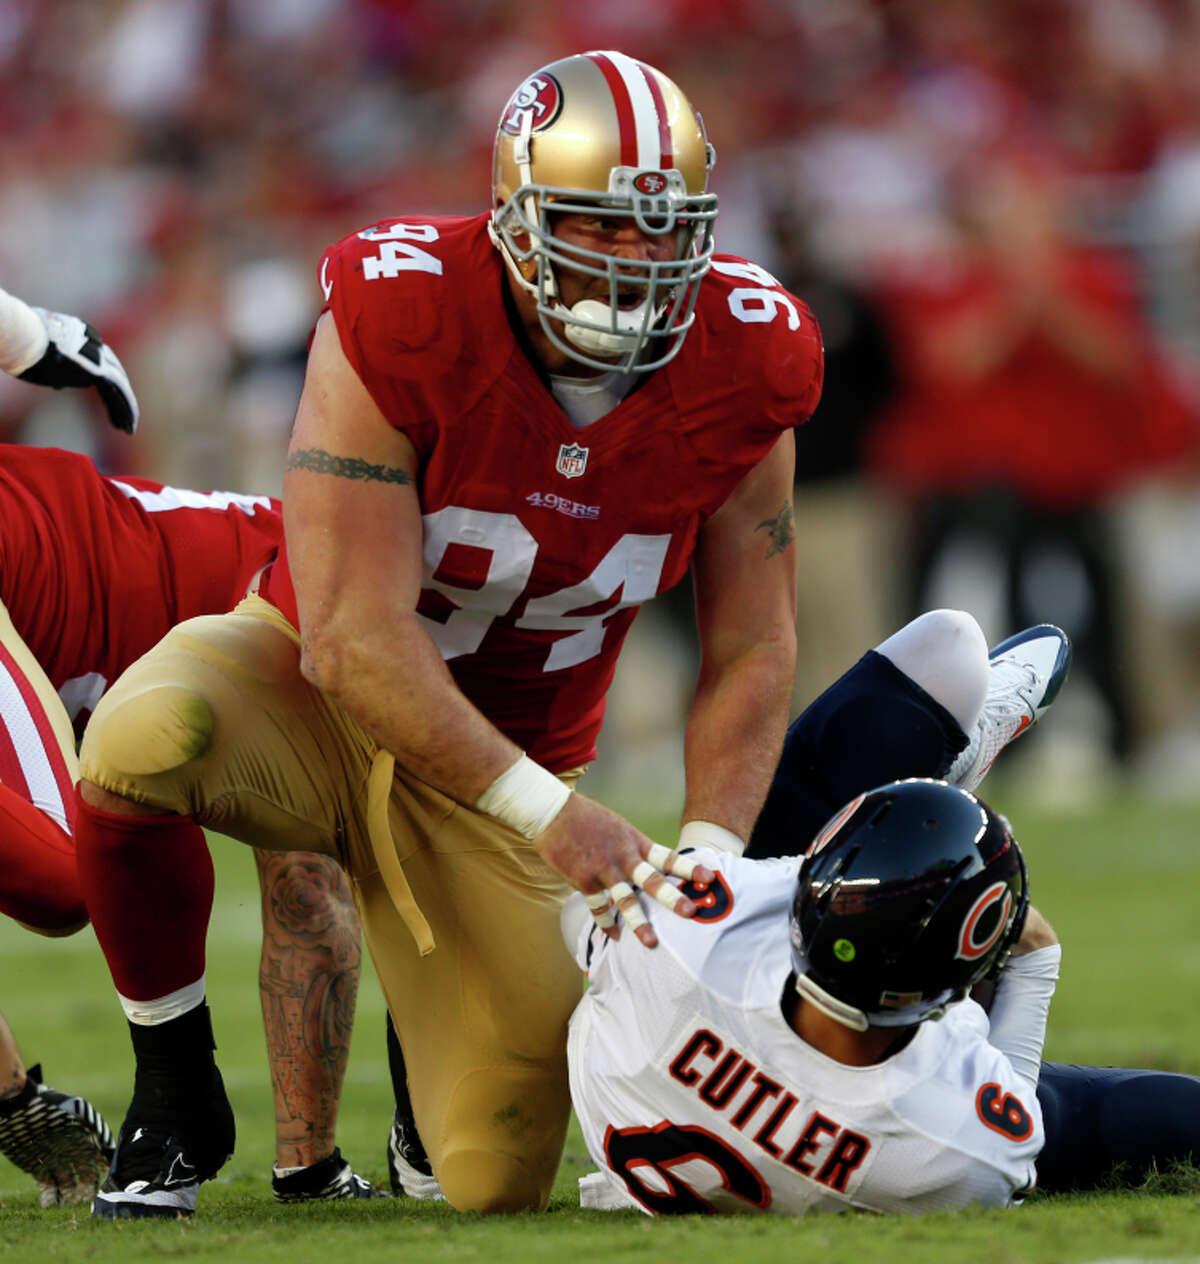 Justin Smith sacks the Bears' Jay Cutler in a game where the defense had a rare failure this season.